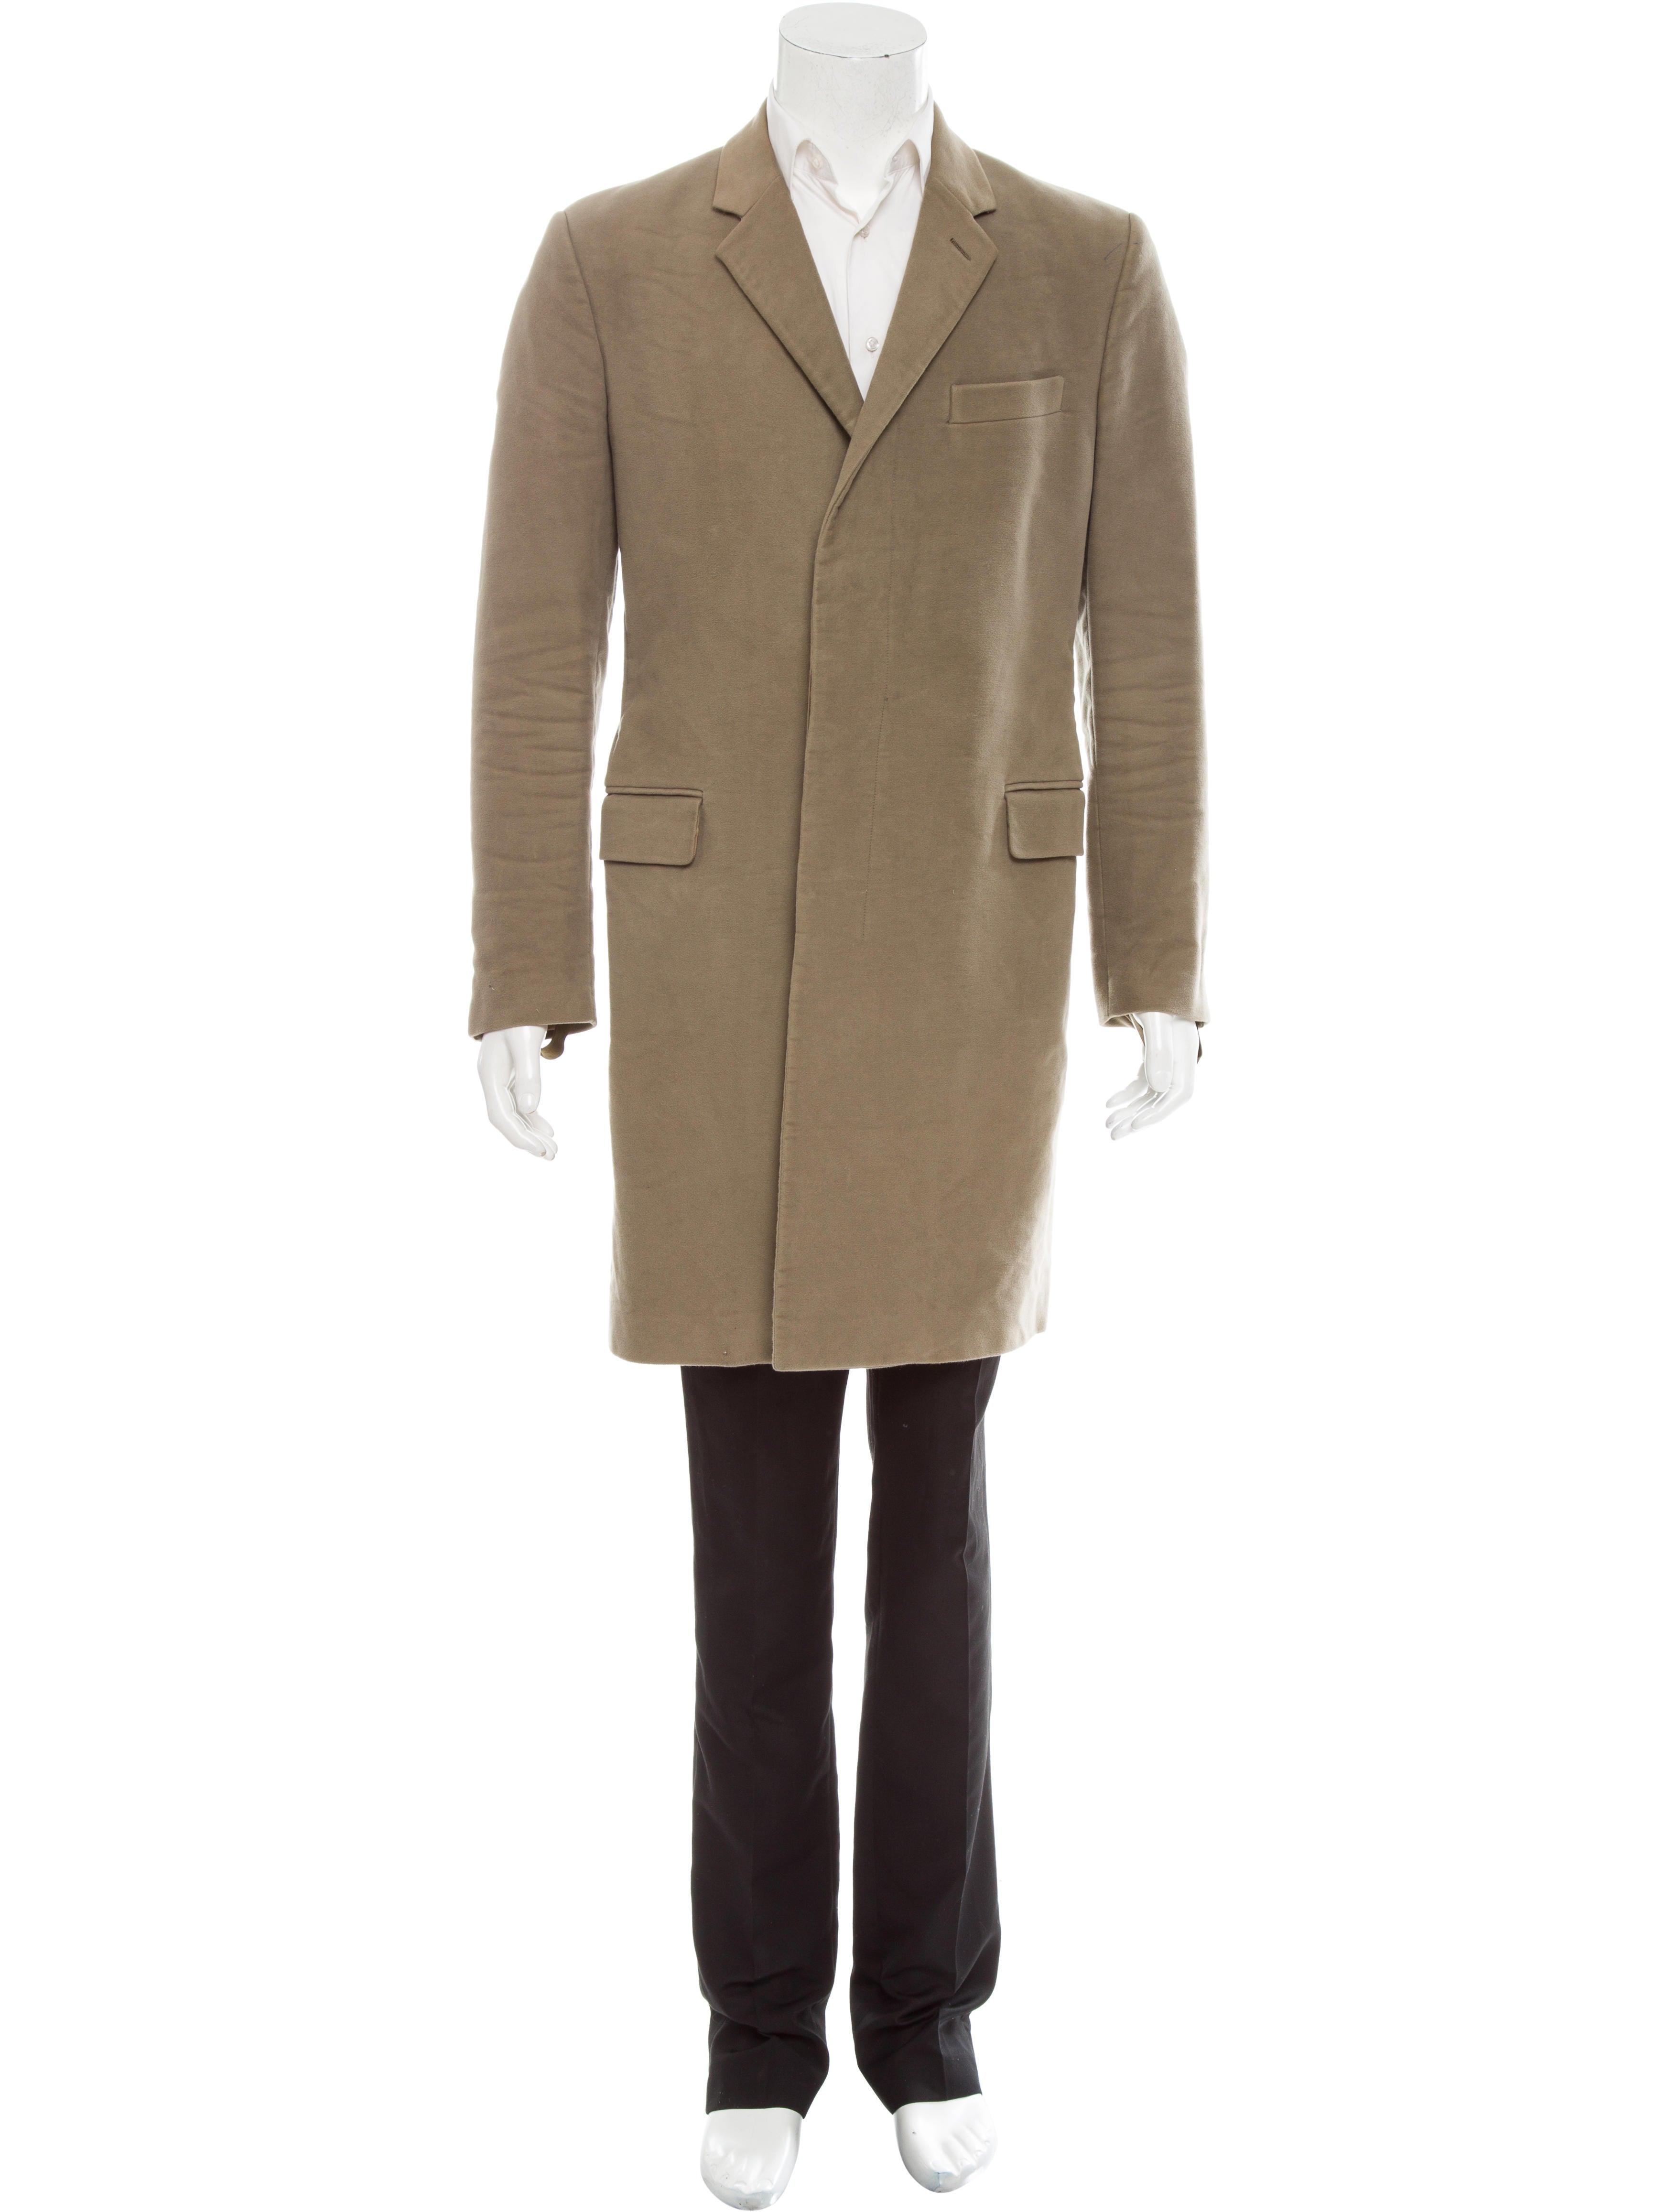 Chesterfield Coat